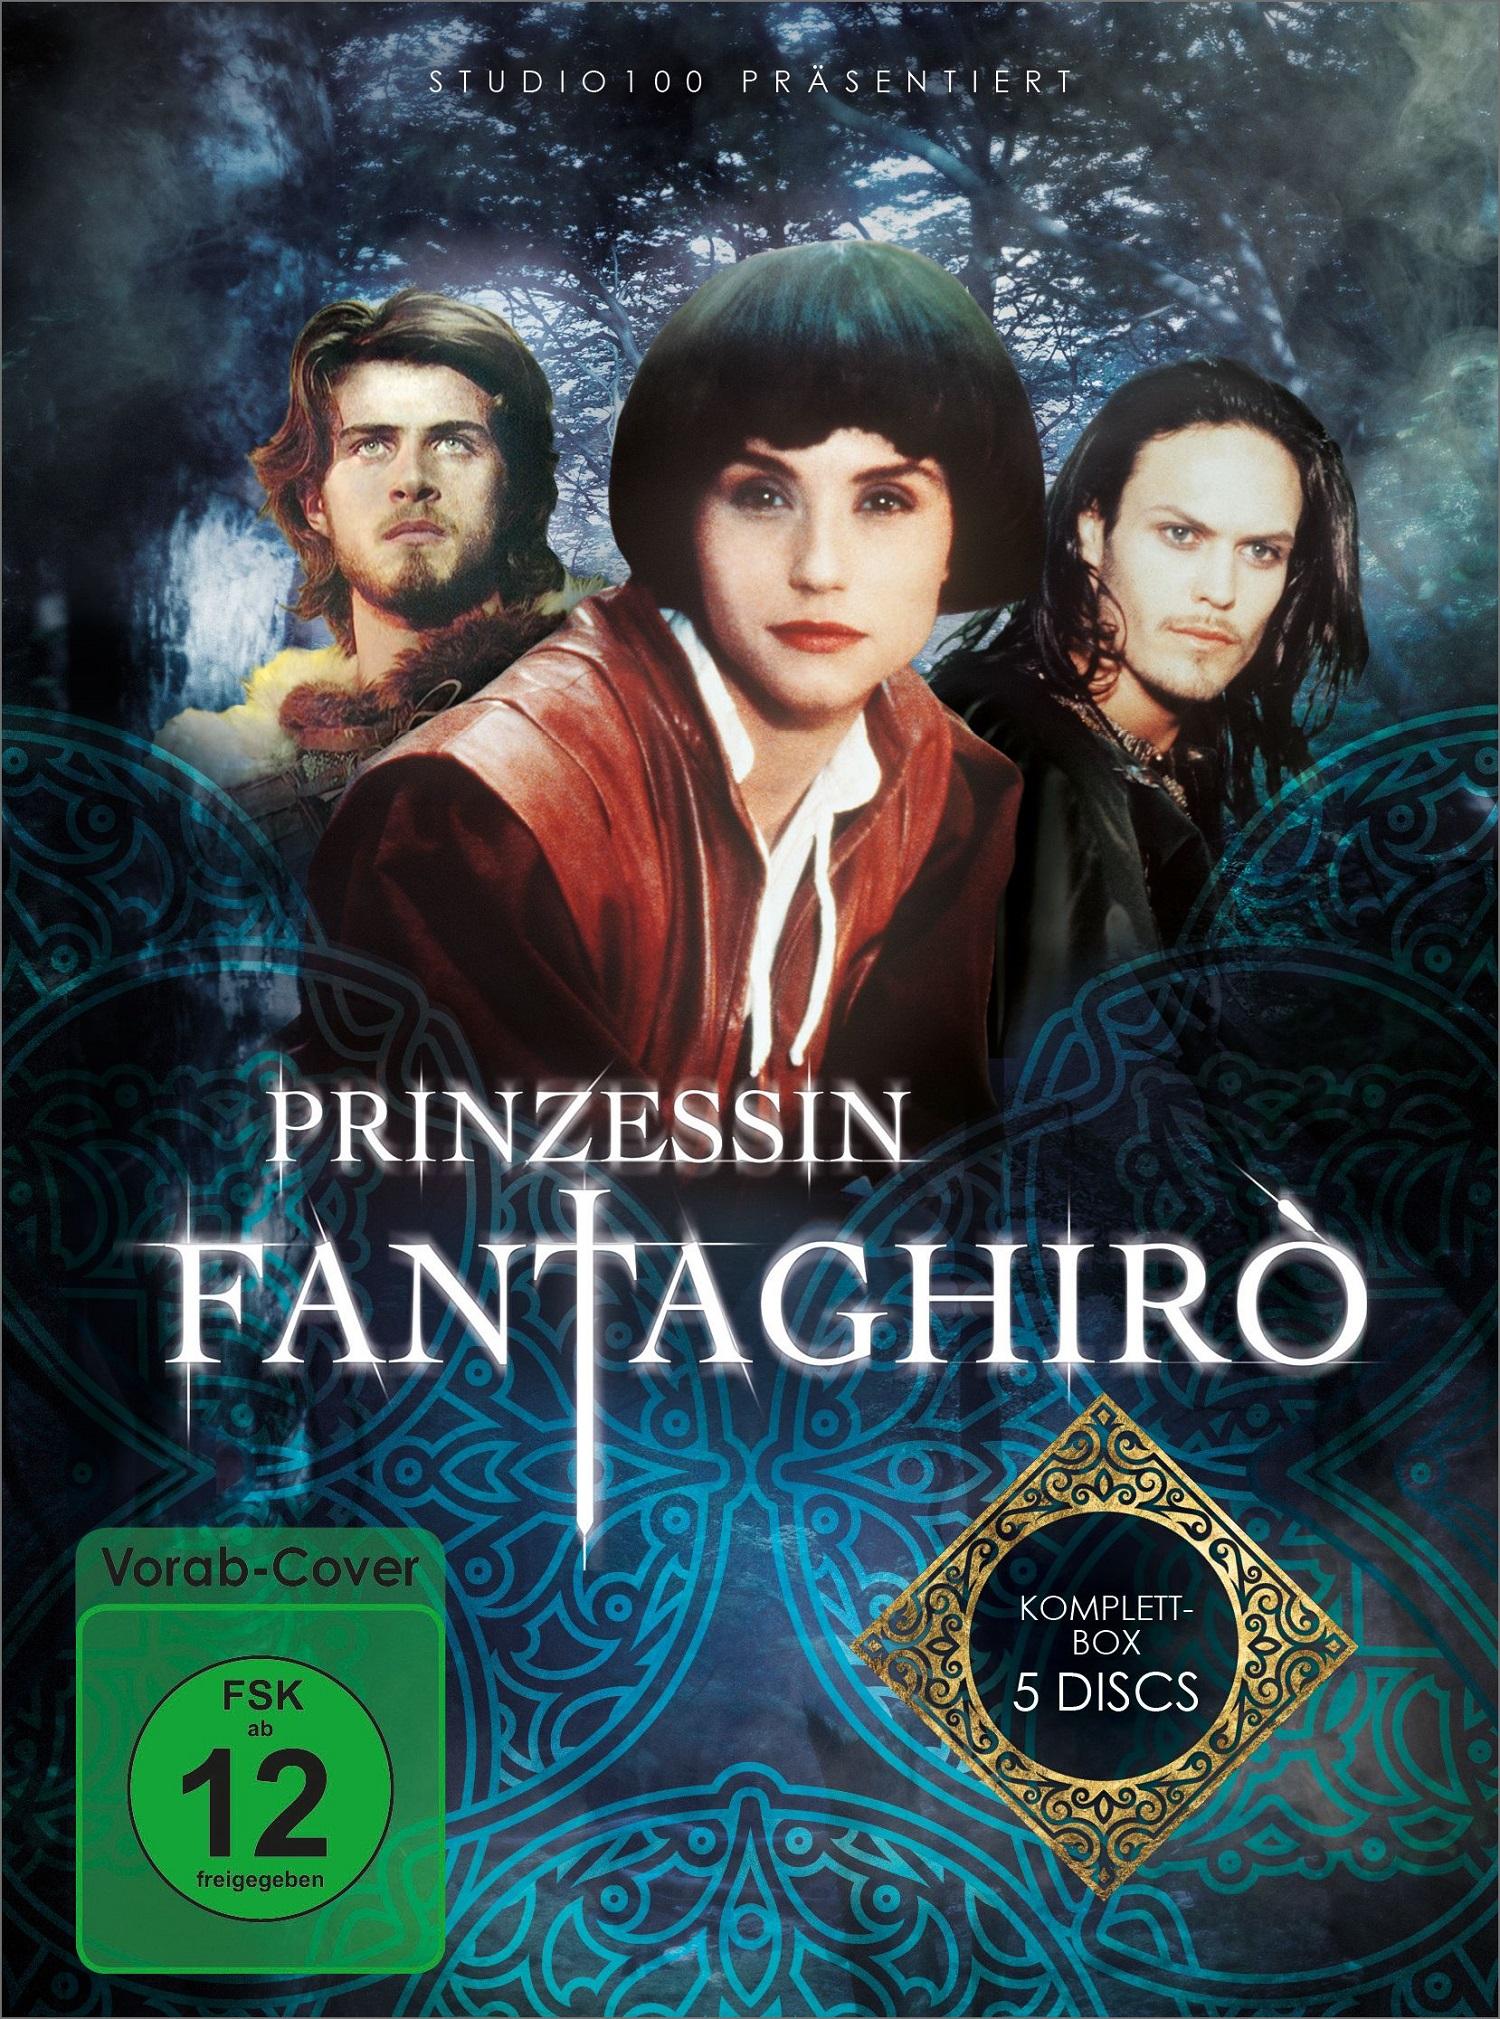 Prinzessin Fantagiro